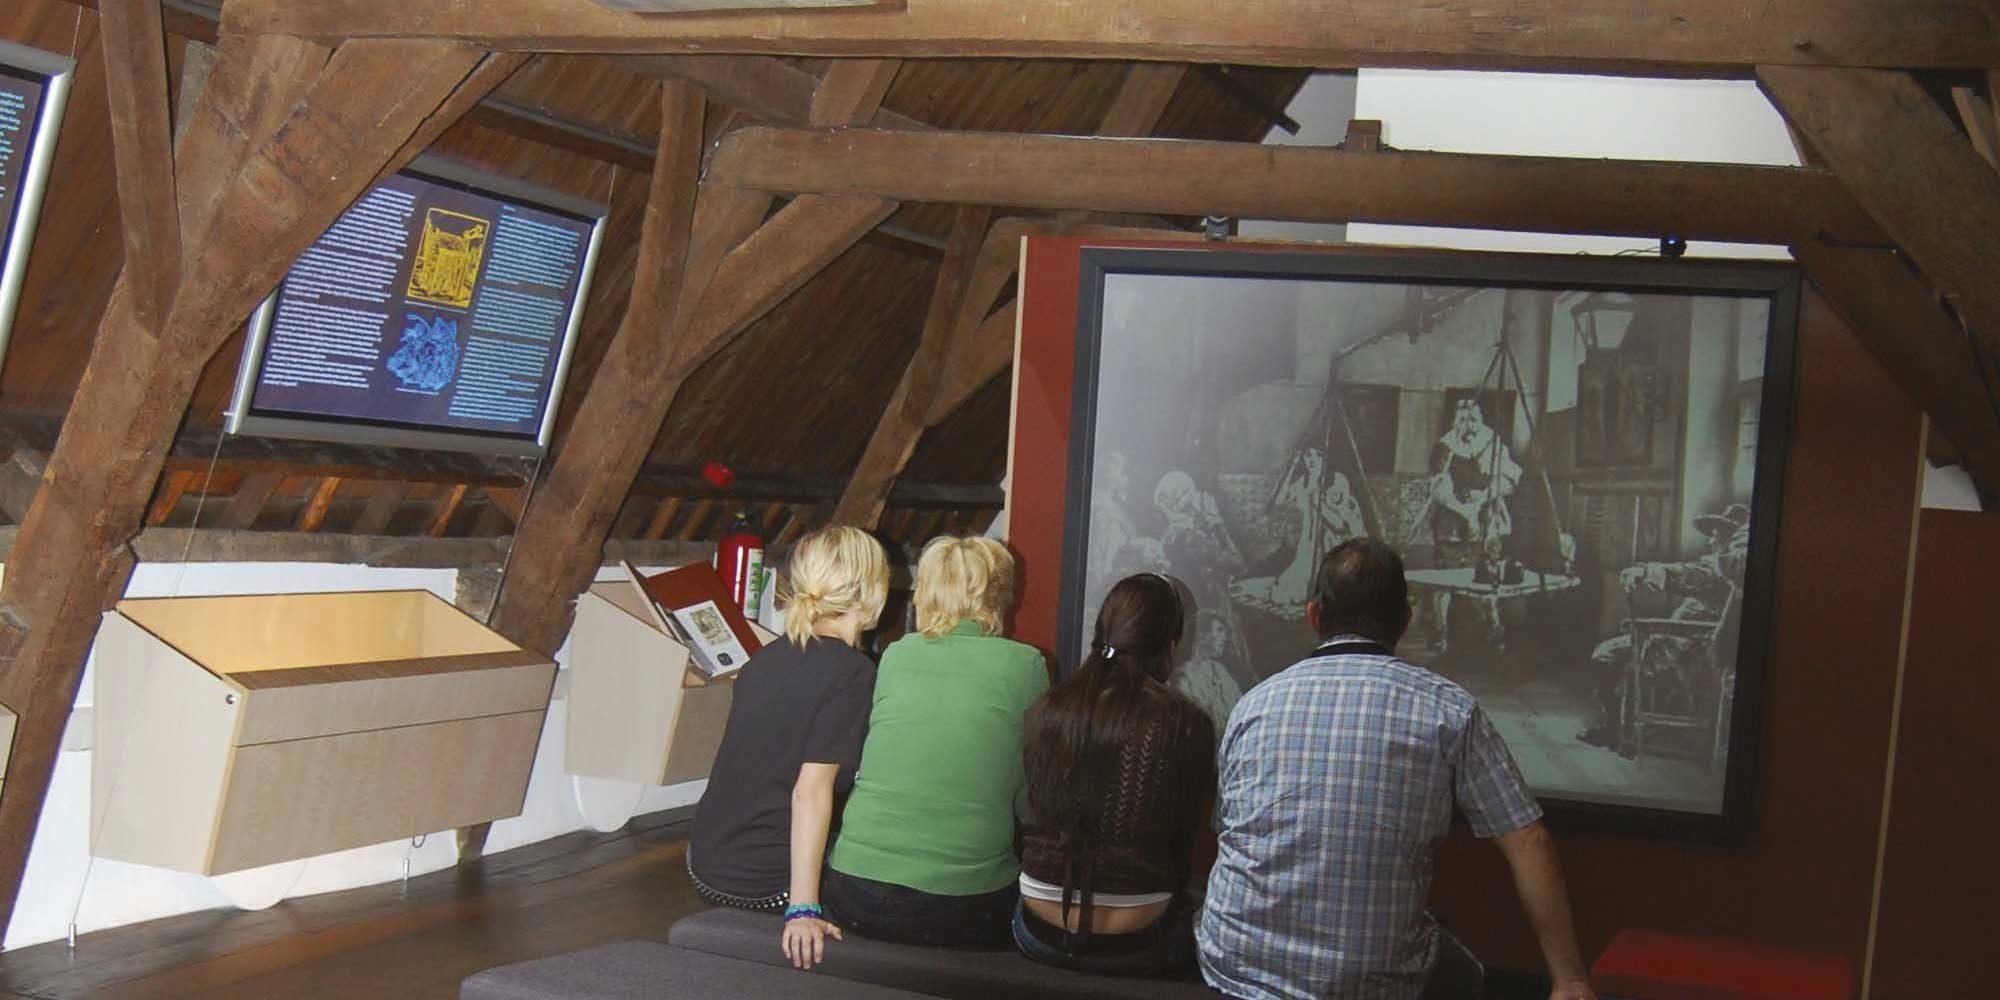 museum de heksenwaag bovenverdieping e1581928480700